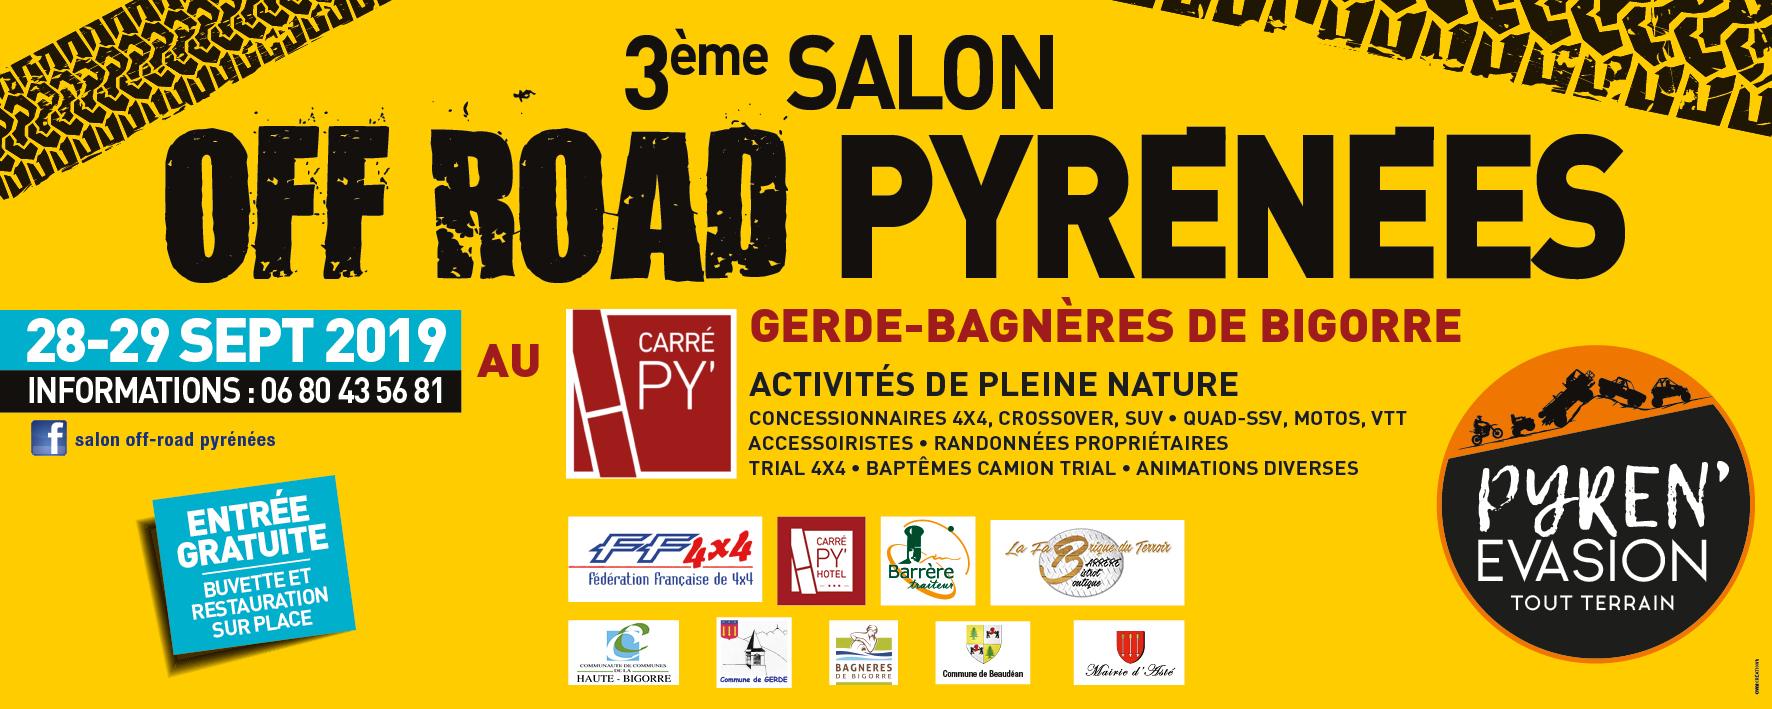 Salon Off-Road  Pyrénées 2019